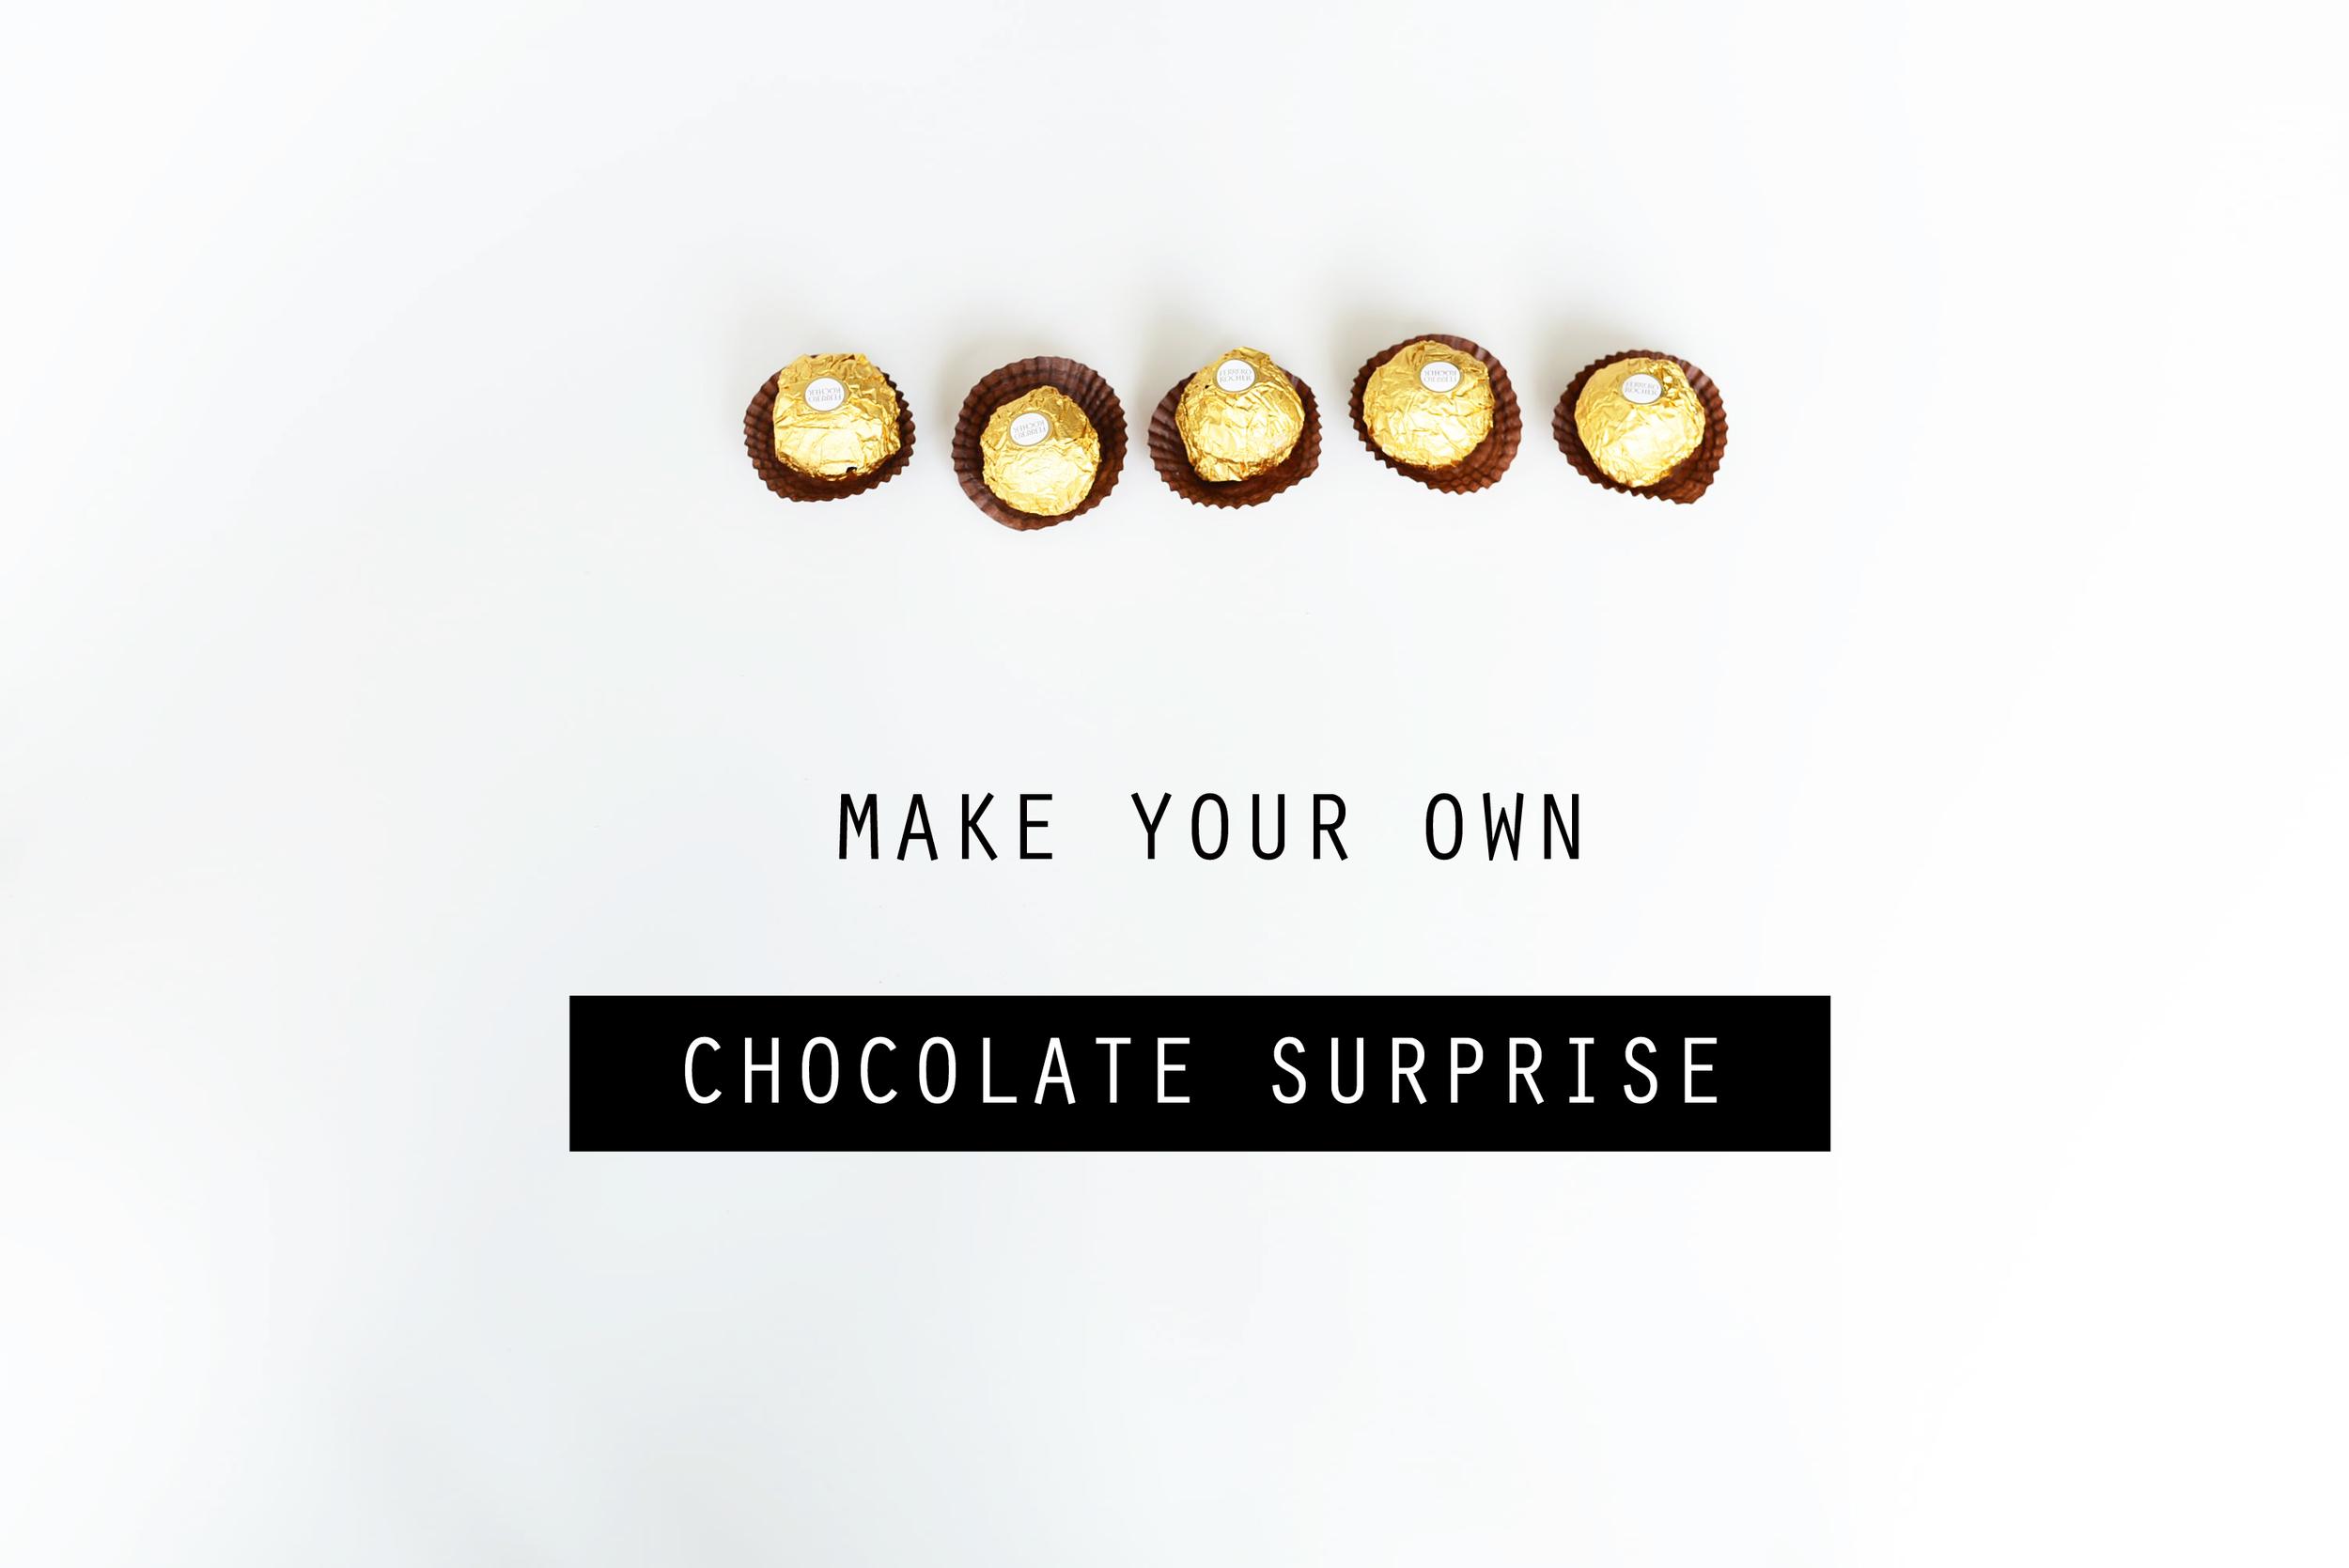 ferrero rocher surprise chocolates :: april fools' day craft   scissors paper stone blog www.scissorspaperstoneblog.com